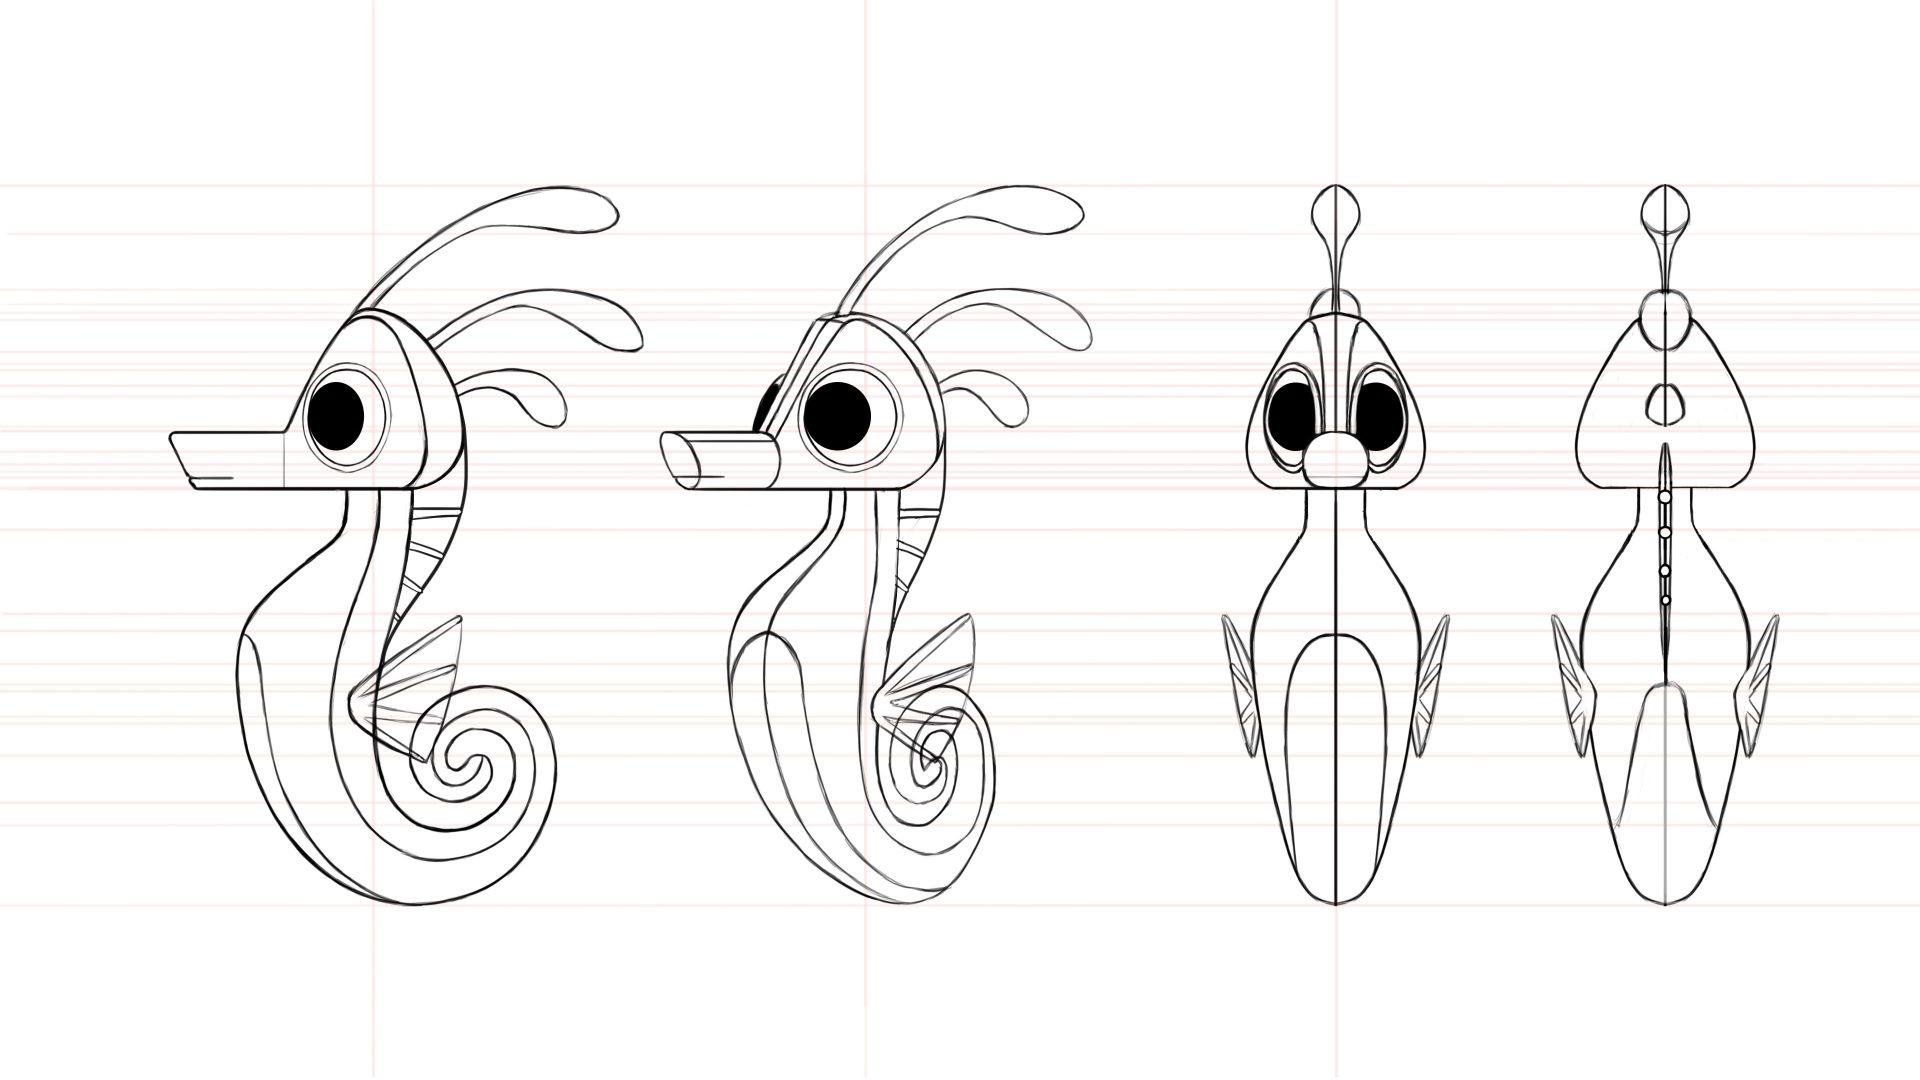 Asn Seahorse Turnaround 1 Female V003